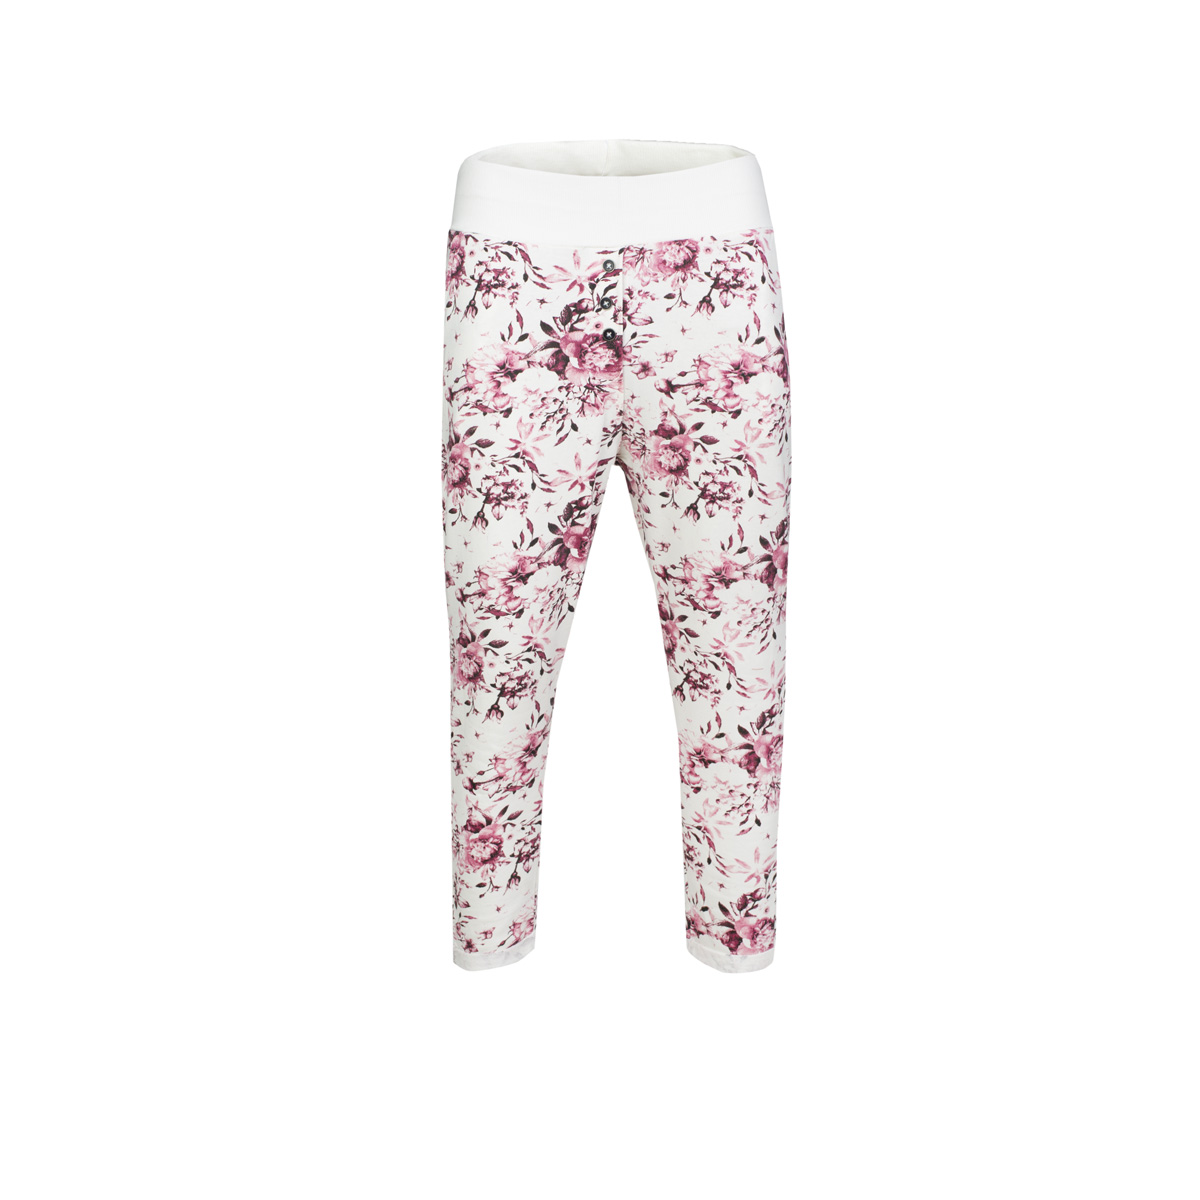 Ženske hlače, umazano bela